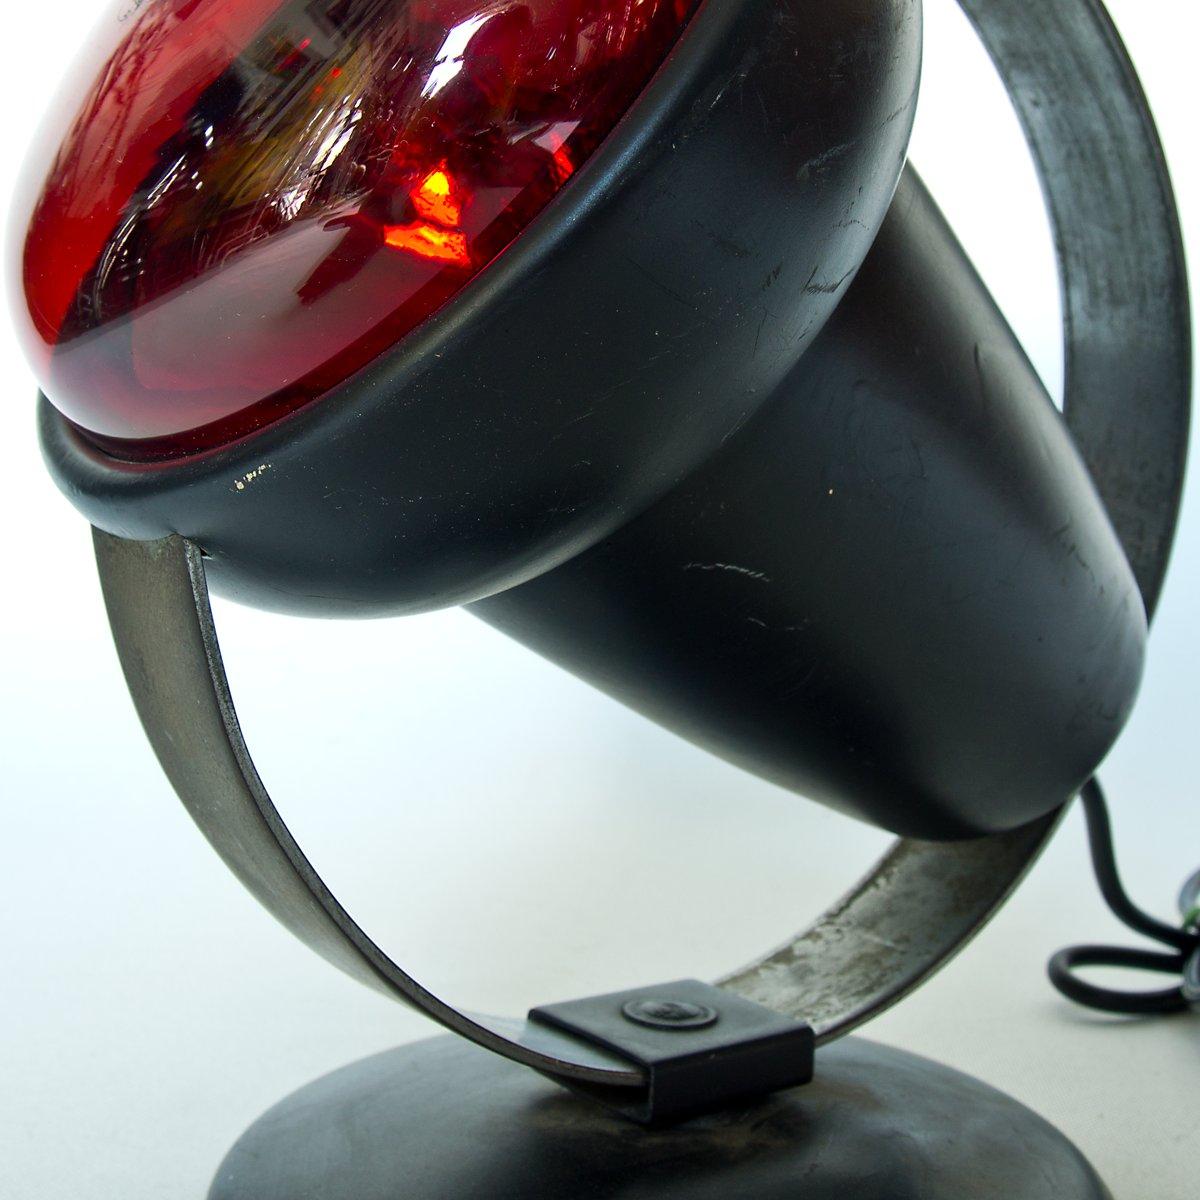 schwarze infrarot lampe von charlotte perriand f r philips. Black Bedroom Furniture Sets. Home Design Ideas